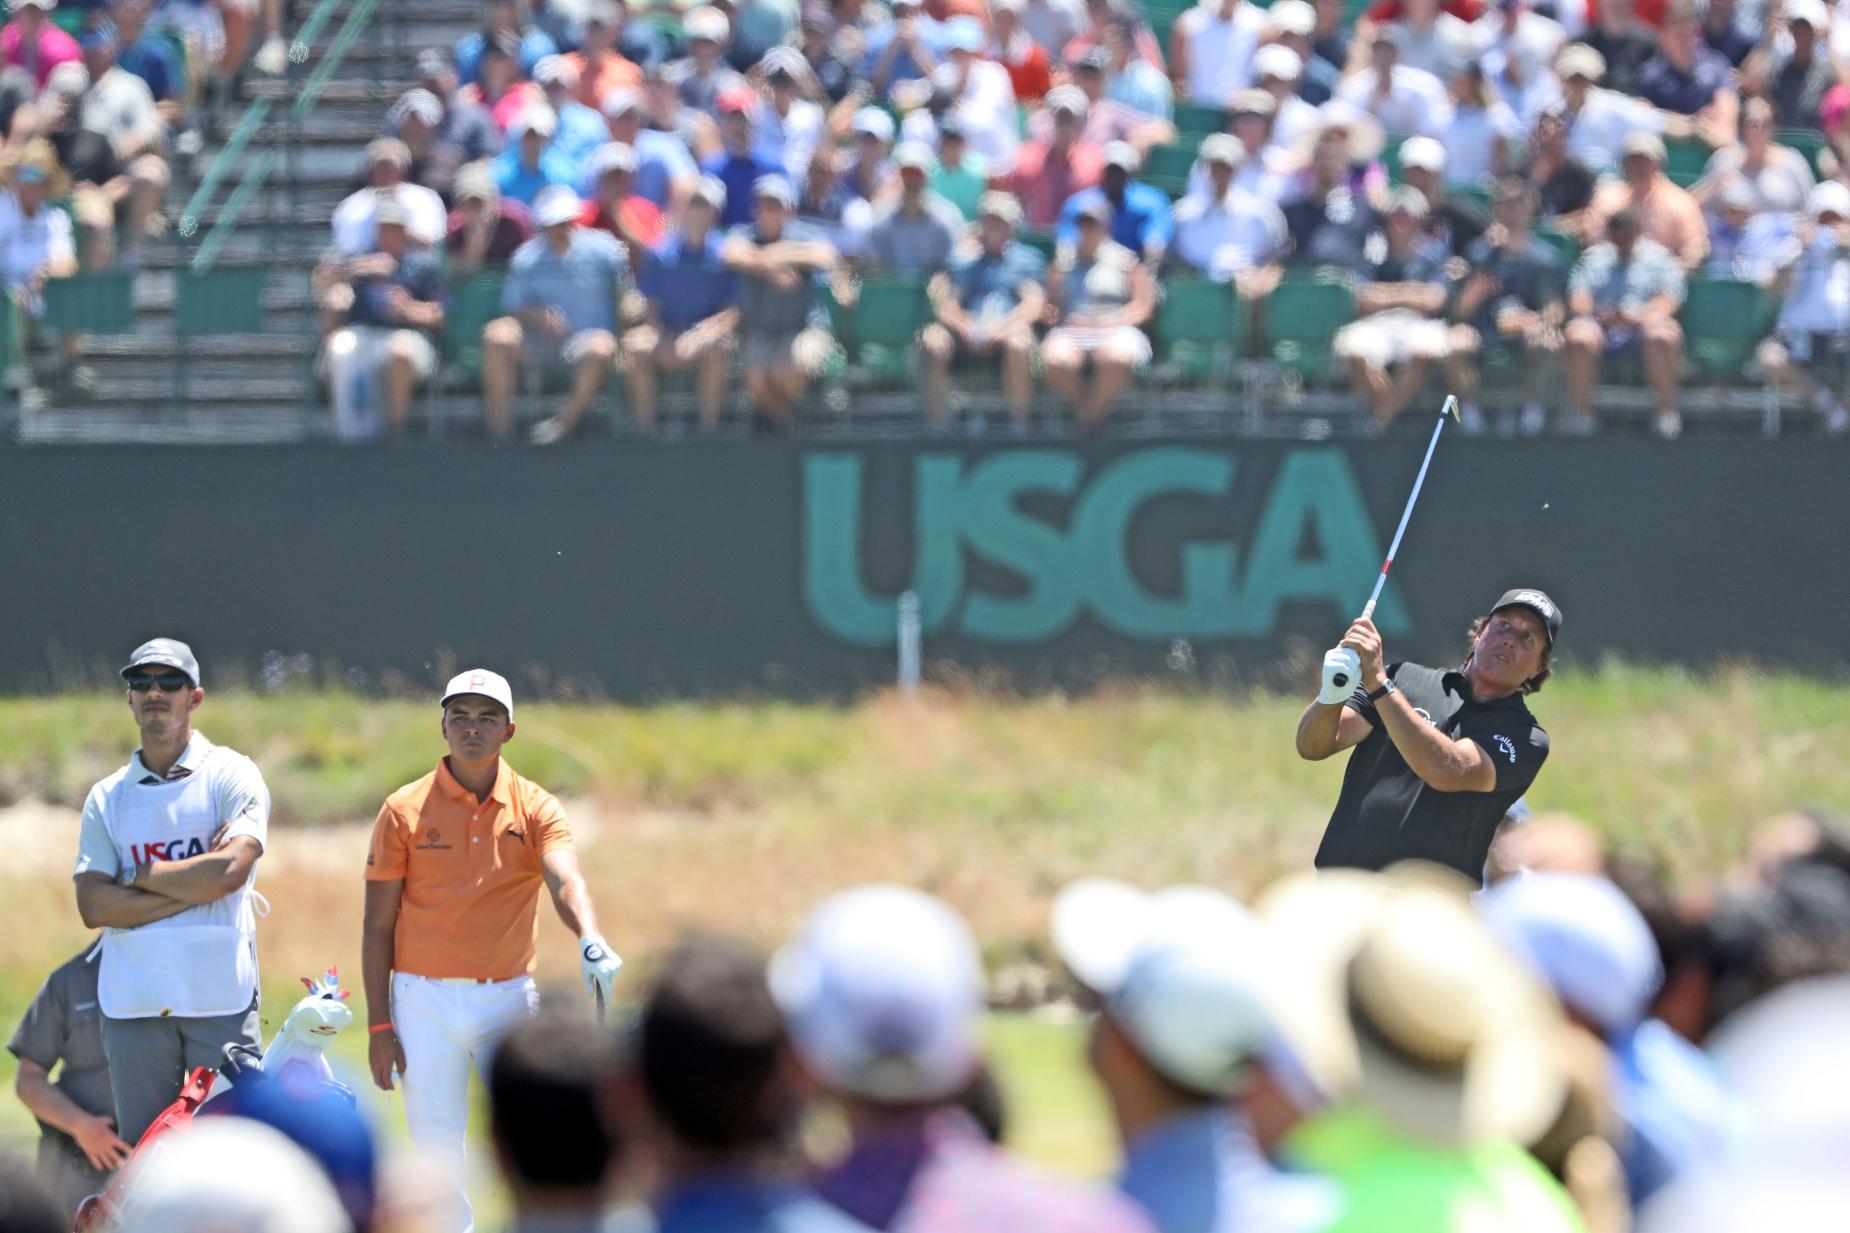 U.S. Open 2018: The USGA got it wrong when it didn't DQ ...